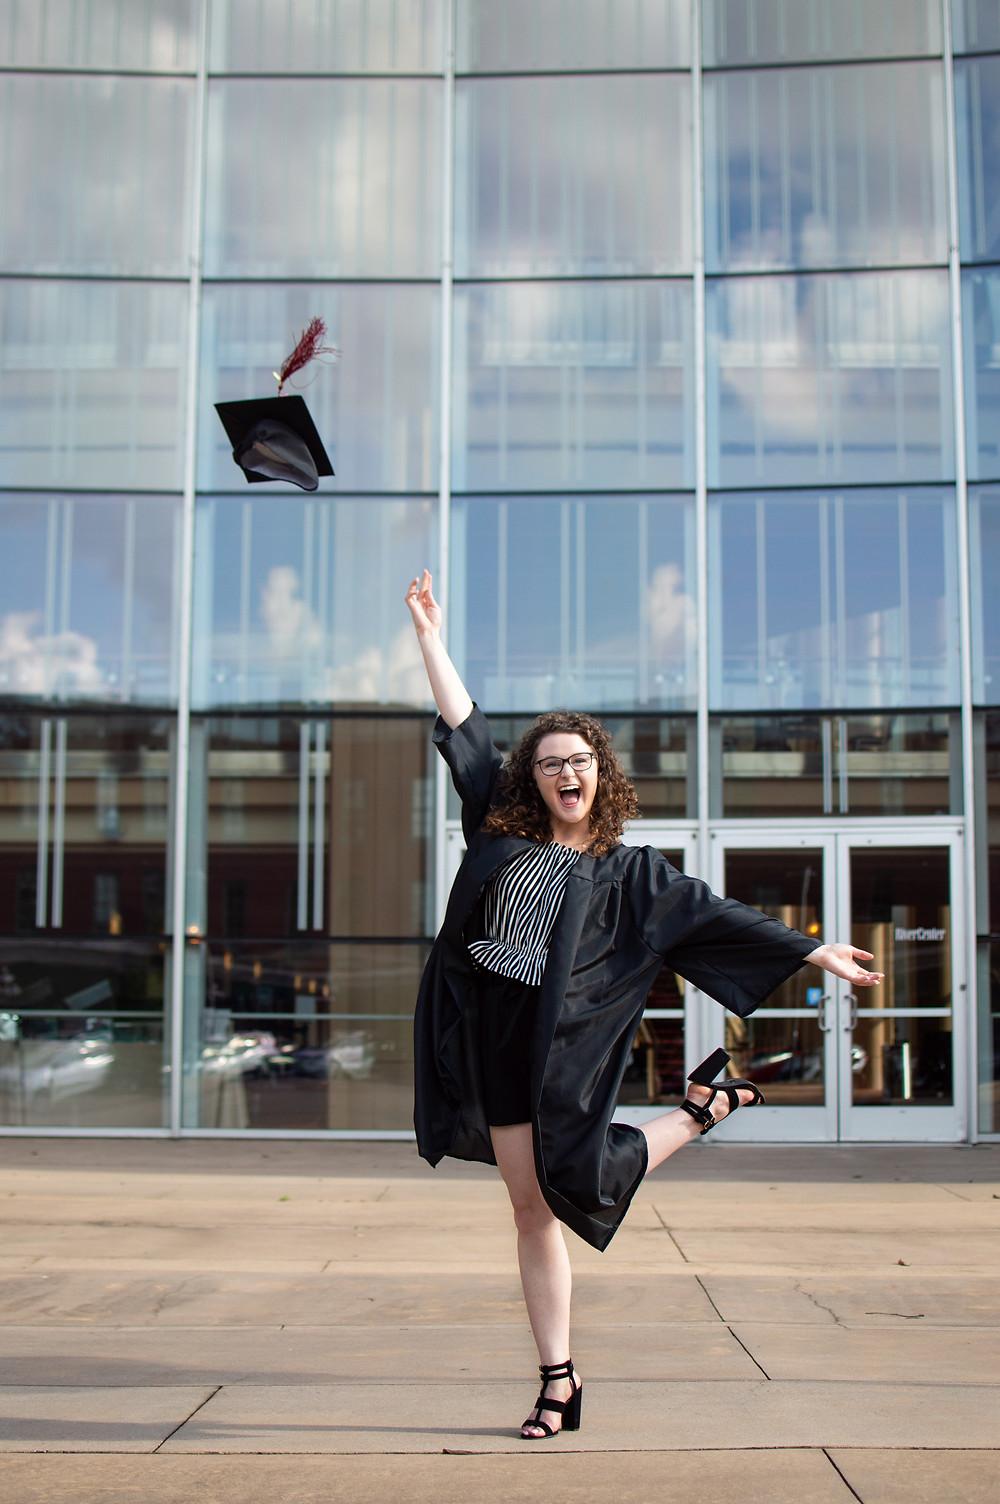 MBA Programs for Fresher Graduates